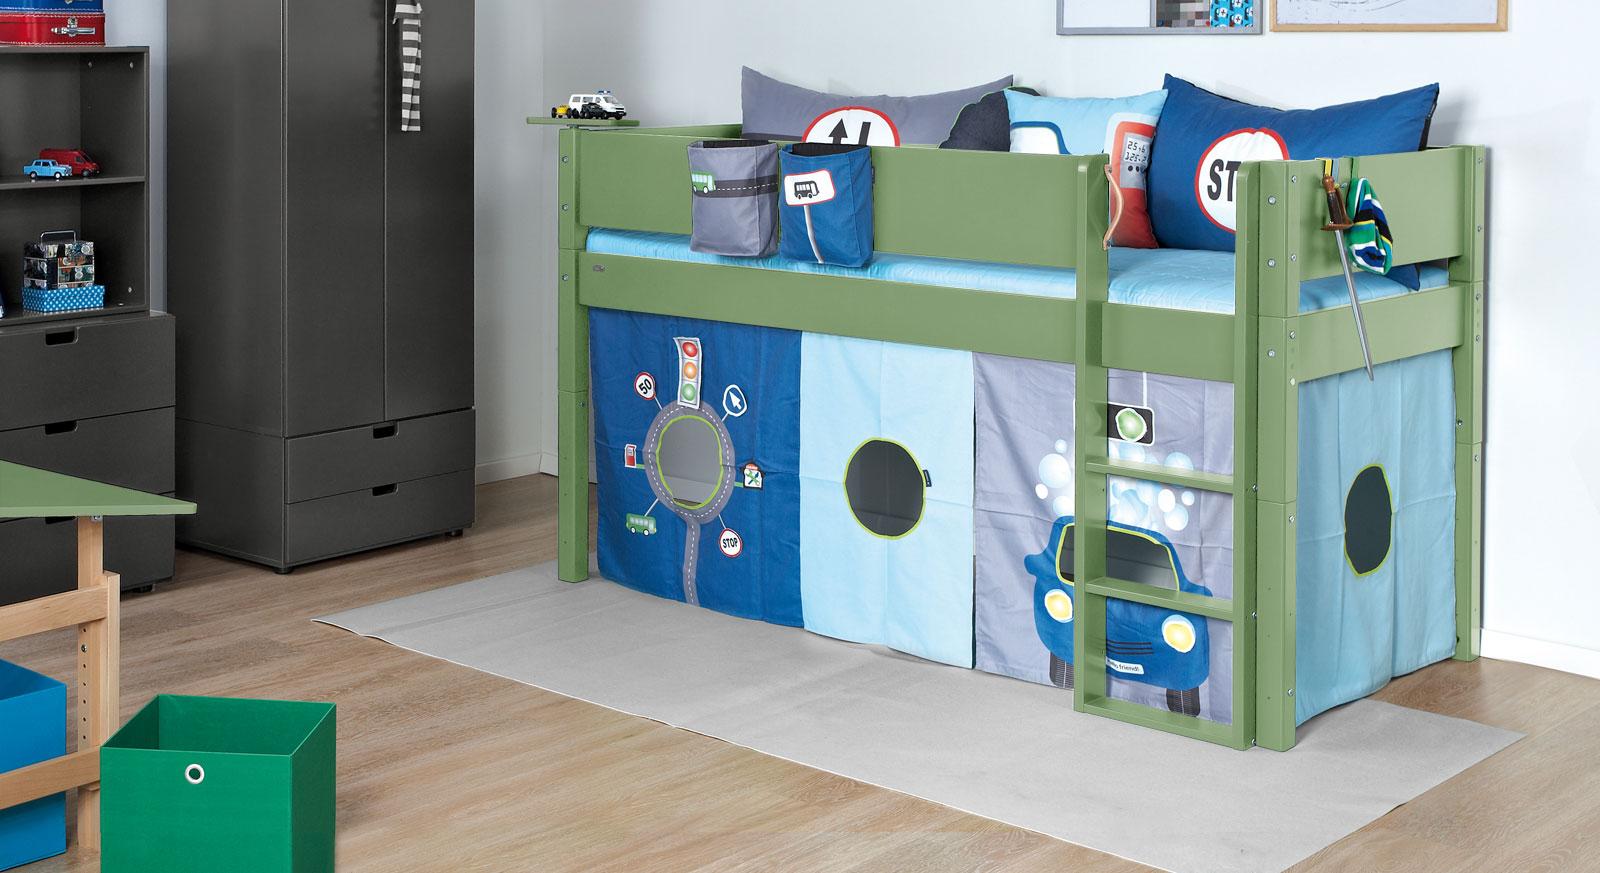 Olivgrünes Mini-Hochbett Kids Town Color aus robustem MDF